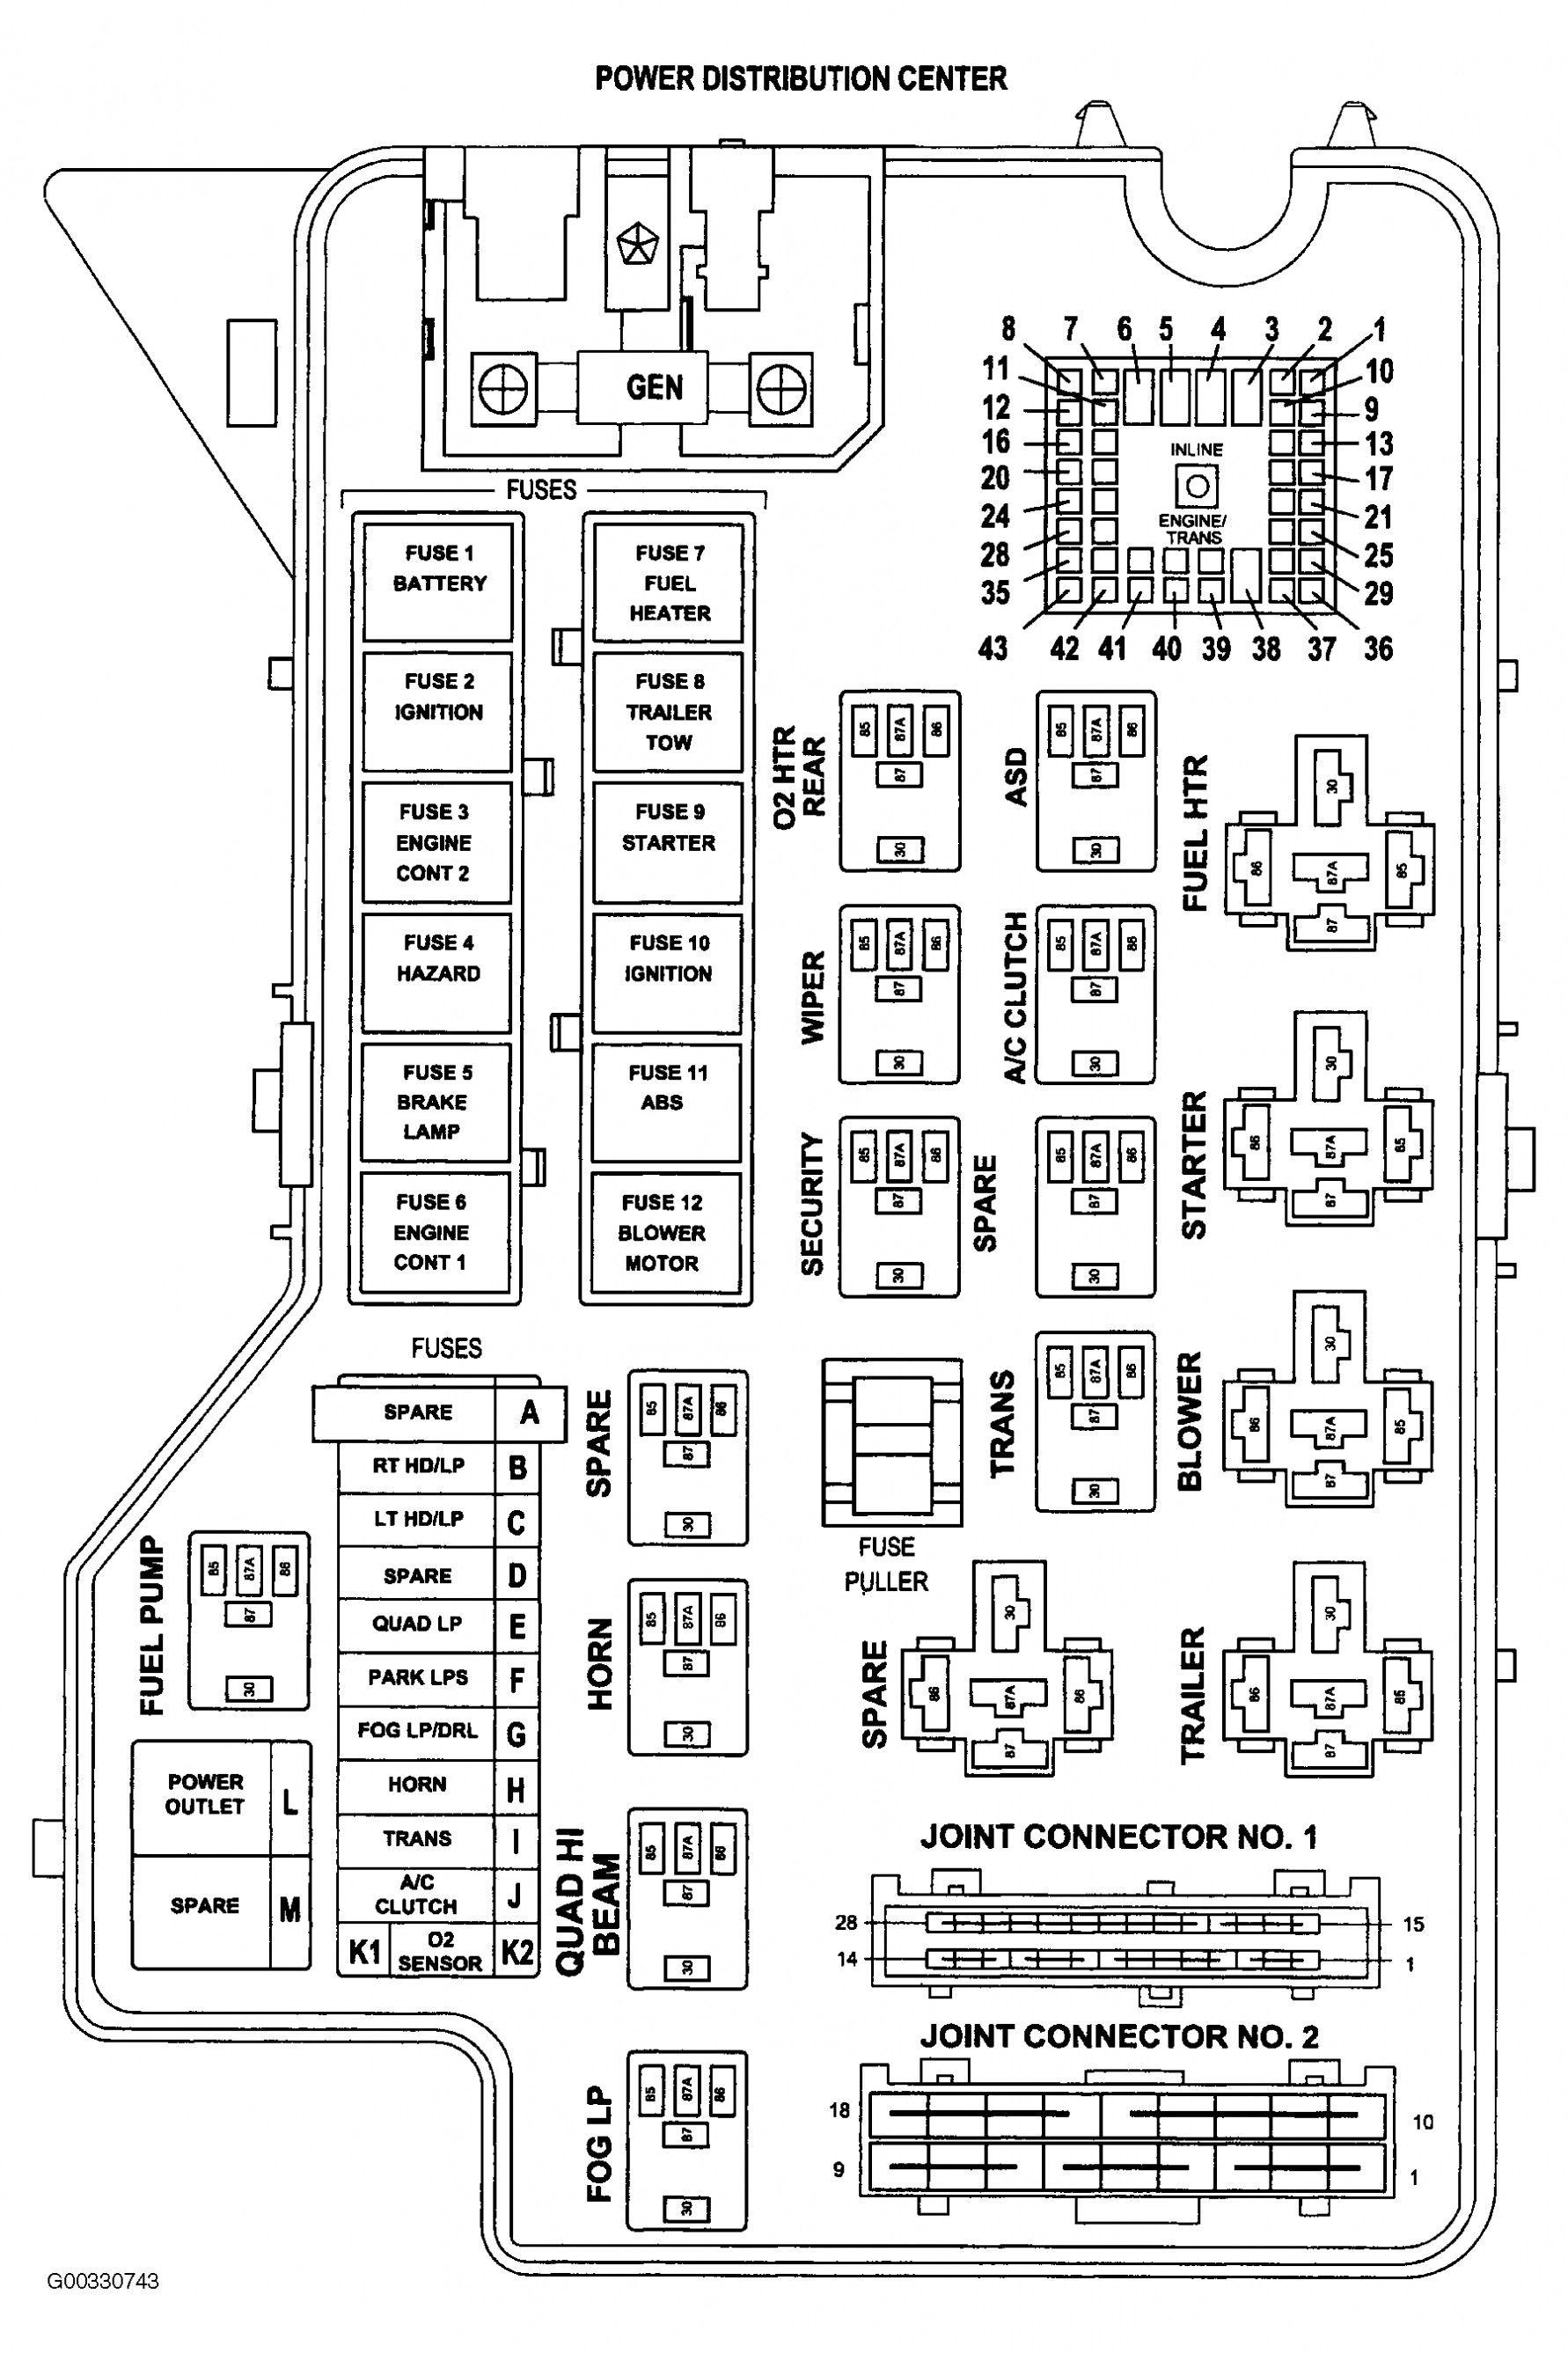 New Wiring Diagram For Dodge Ram Radio Diagram